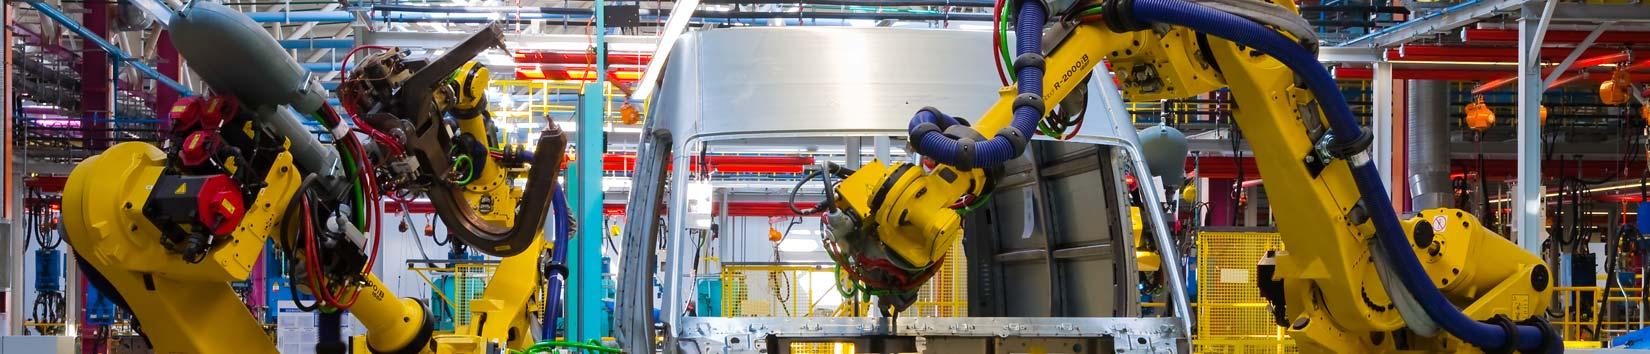 Bios elettronica per l'industria